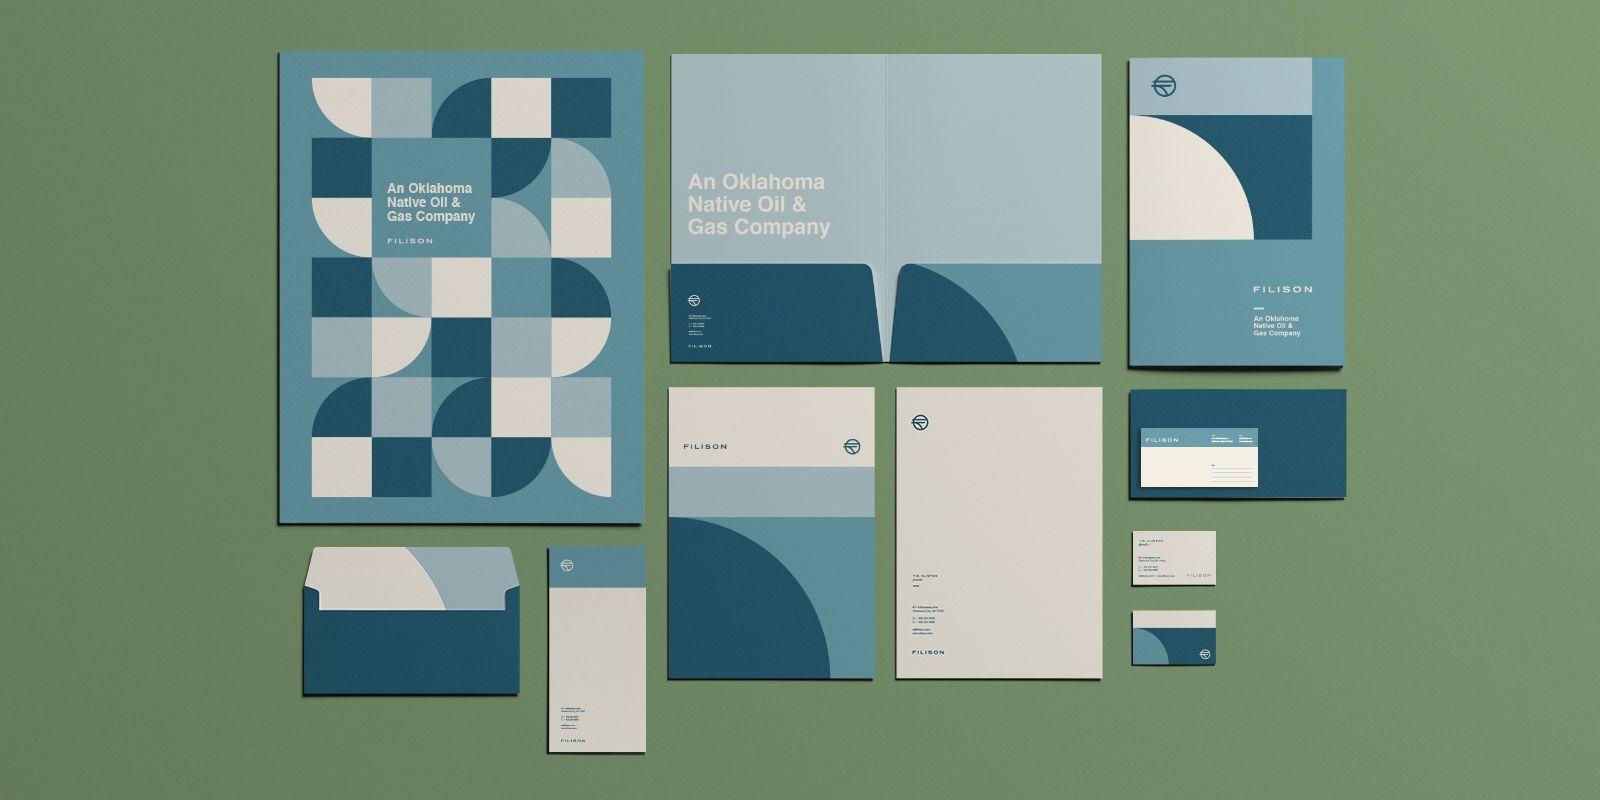 Fillison Mast Learning Graphic Design Visual Identity Design Branding Design Inspiration